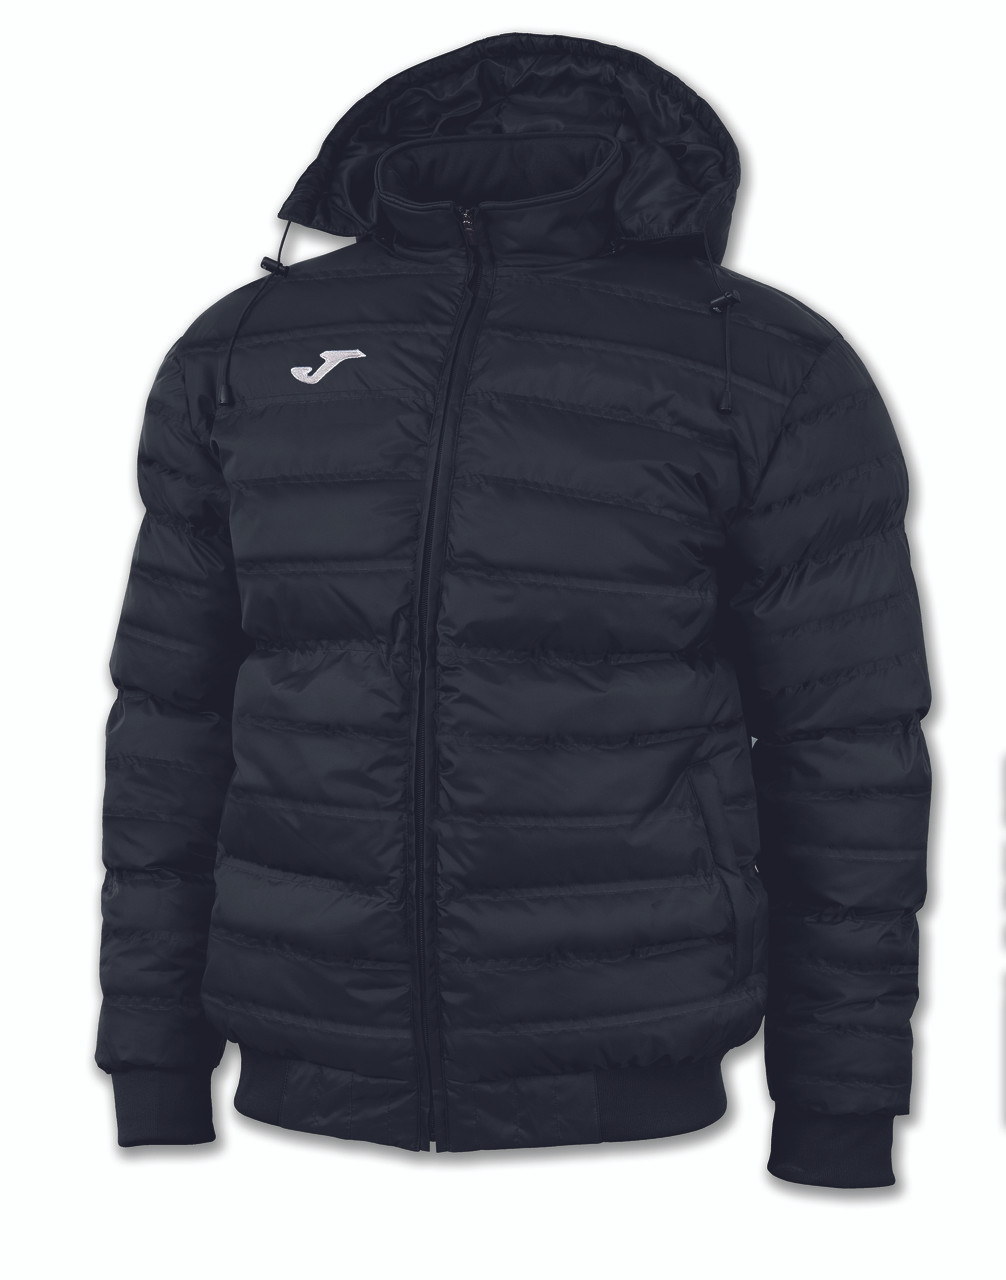 948f2ddbe6d69 Joma Urban Bomber Jacket - Galaxyfootball